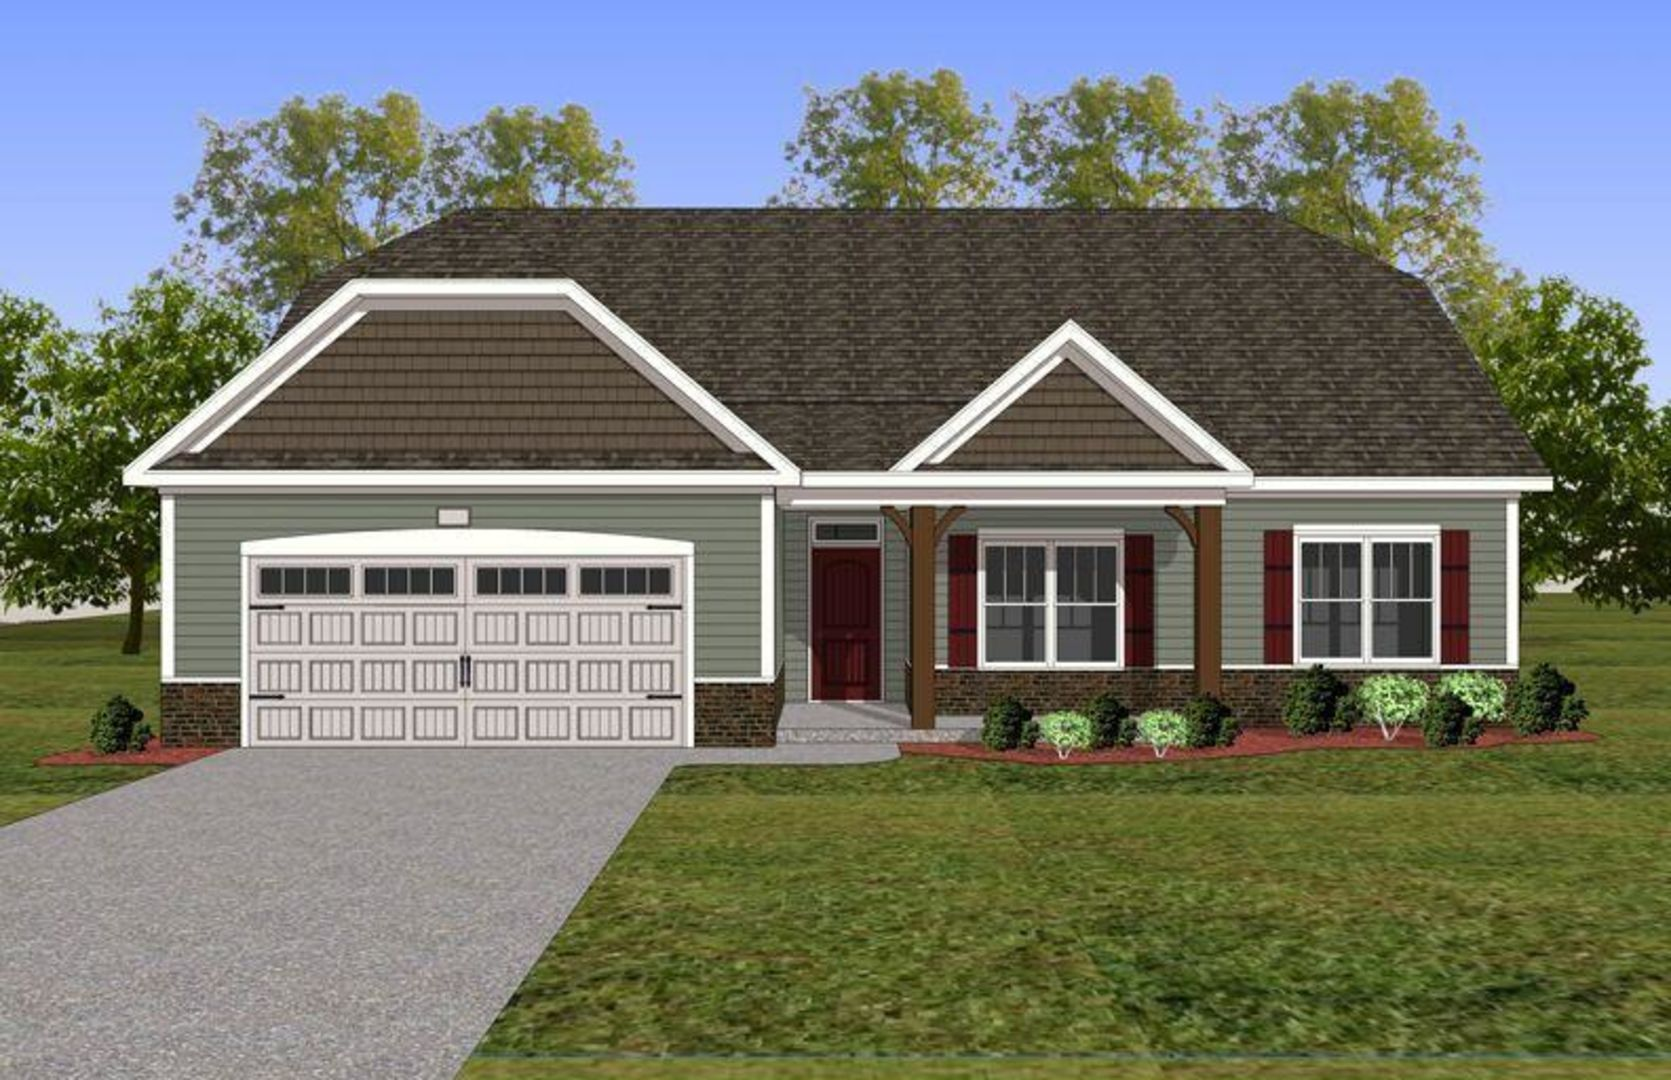 Single Family for Sale at Edgemont 2037 Lindrick Court Nw Calabash, North Carolina 28467 United States